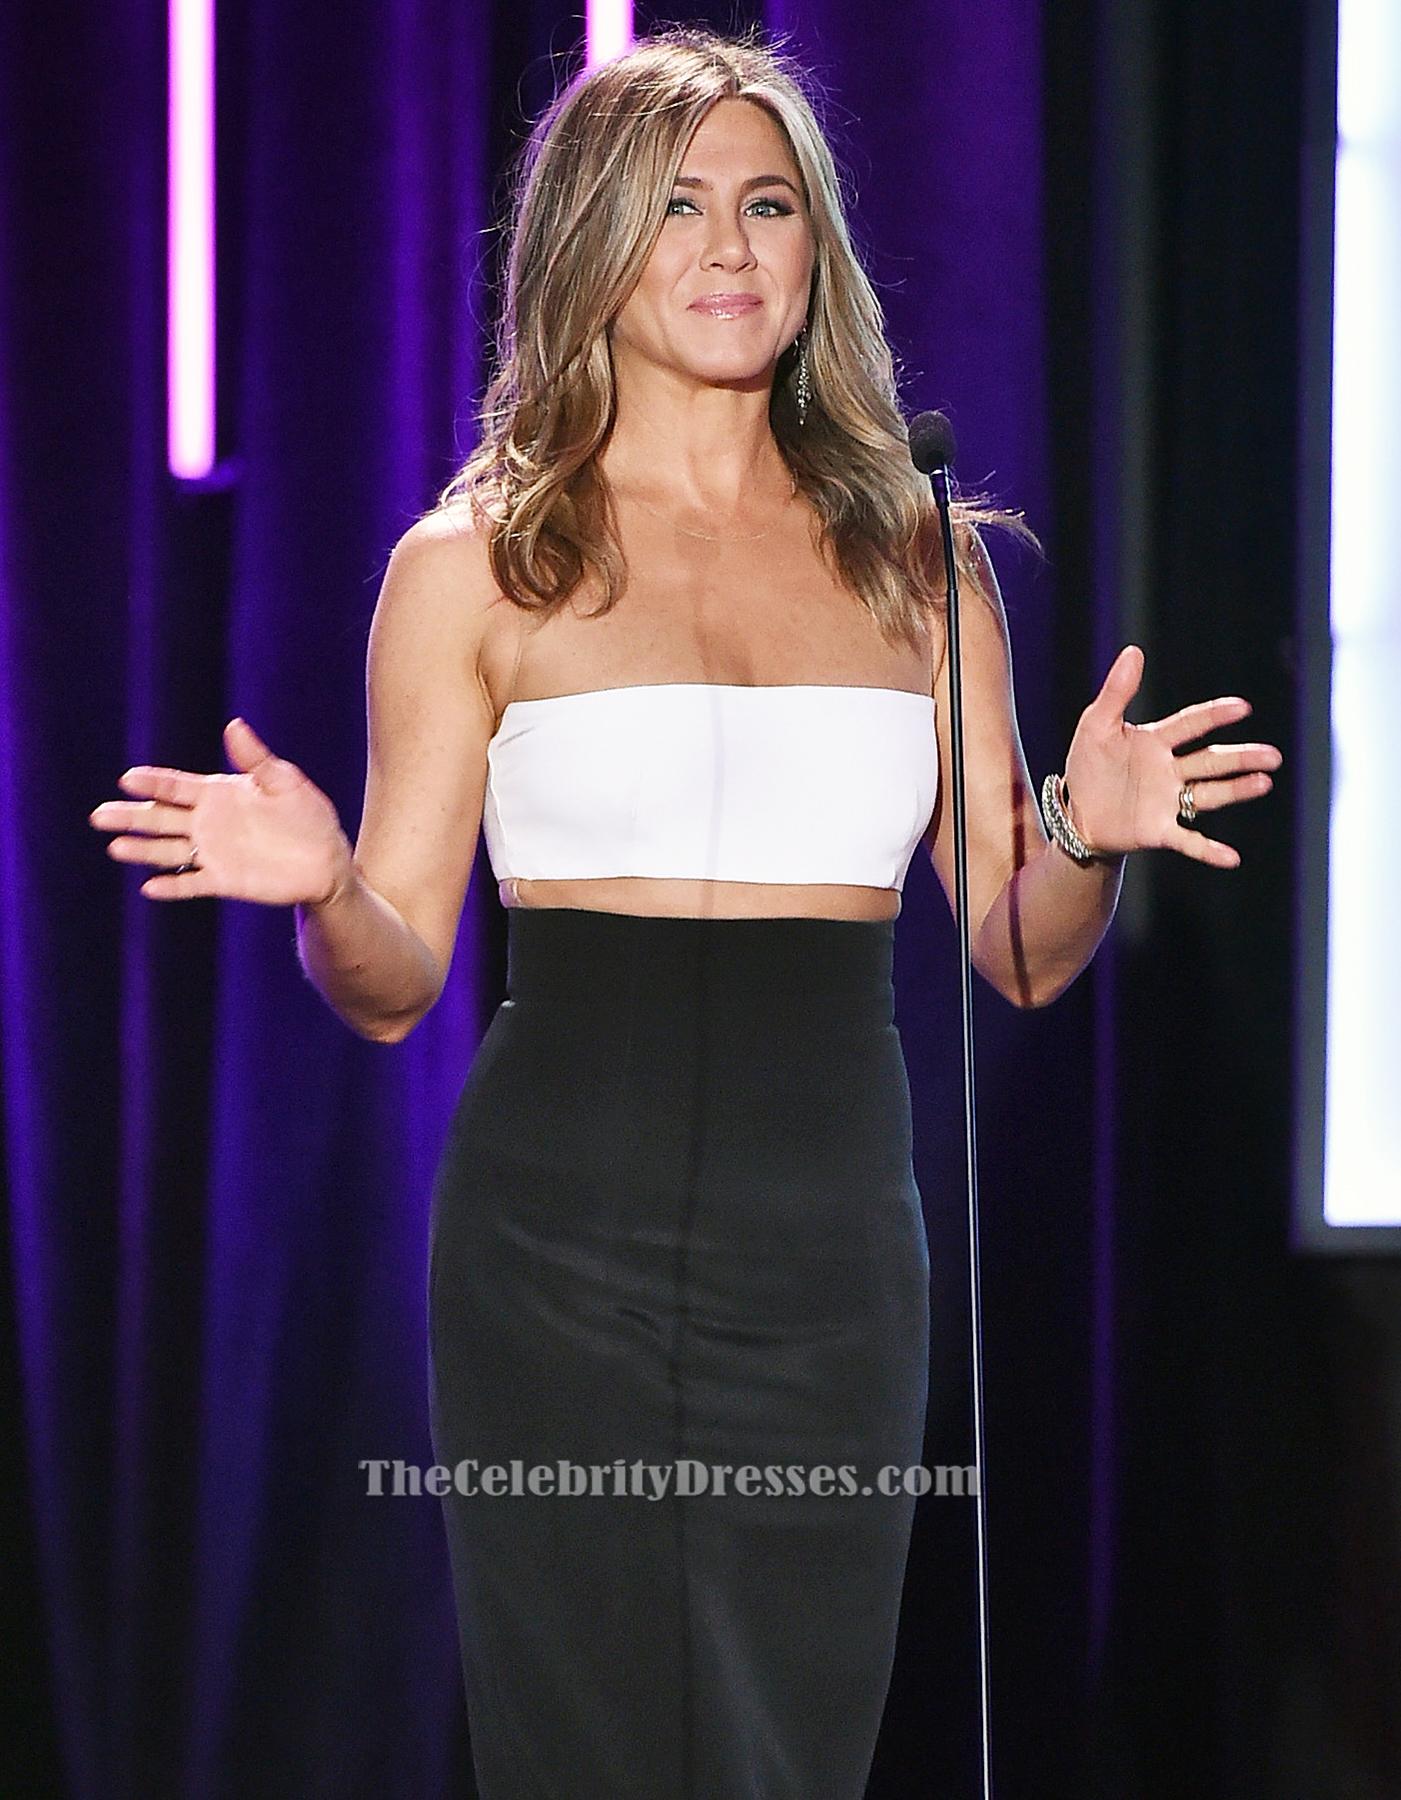 Jennifer Aniston White And Black Evening Dress 29th